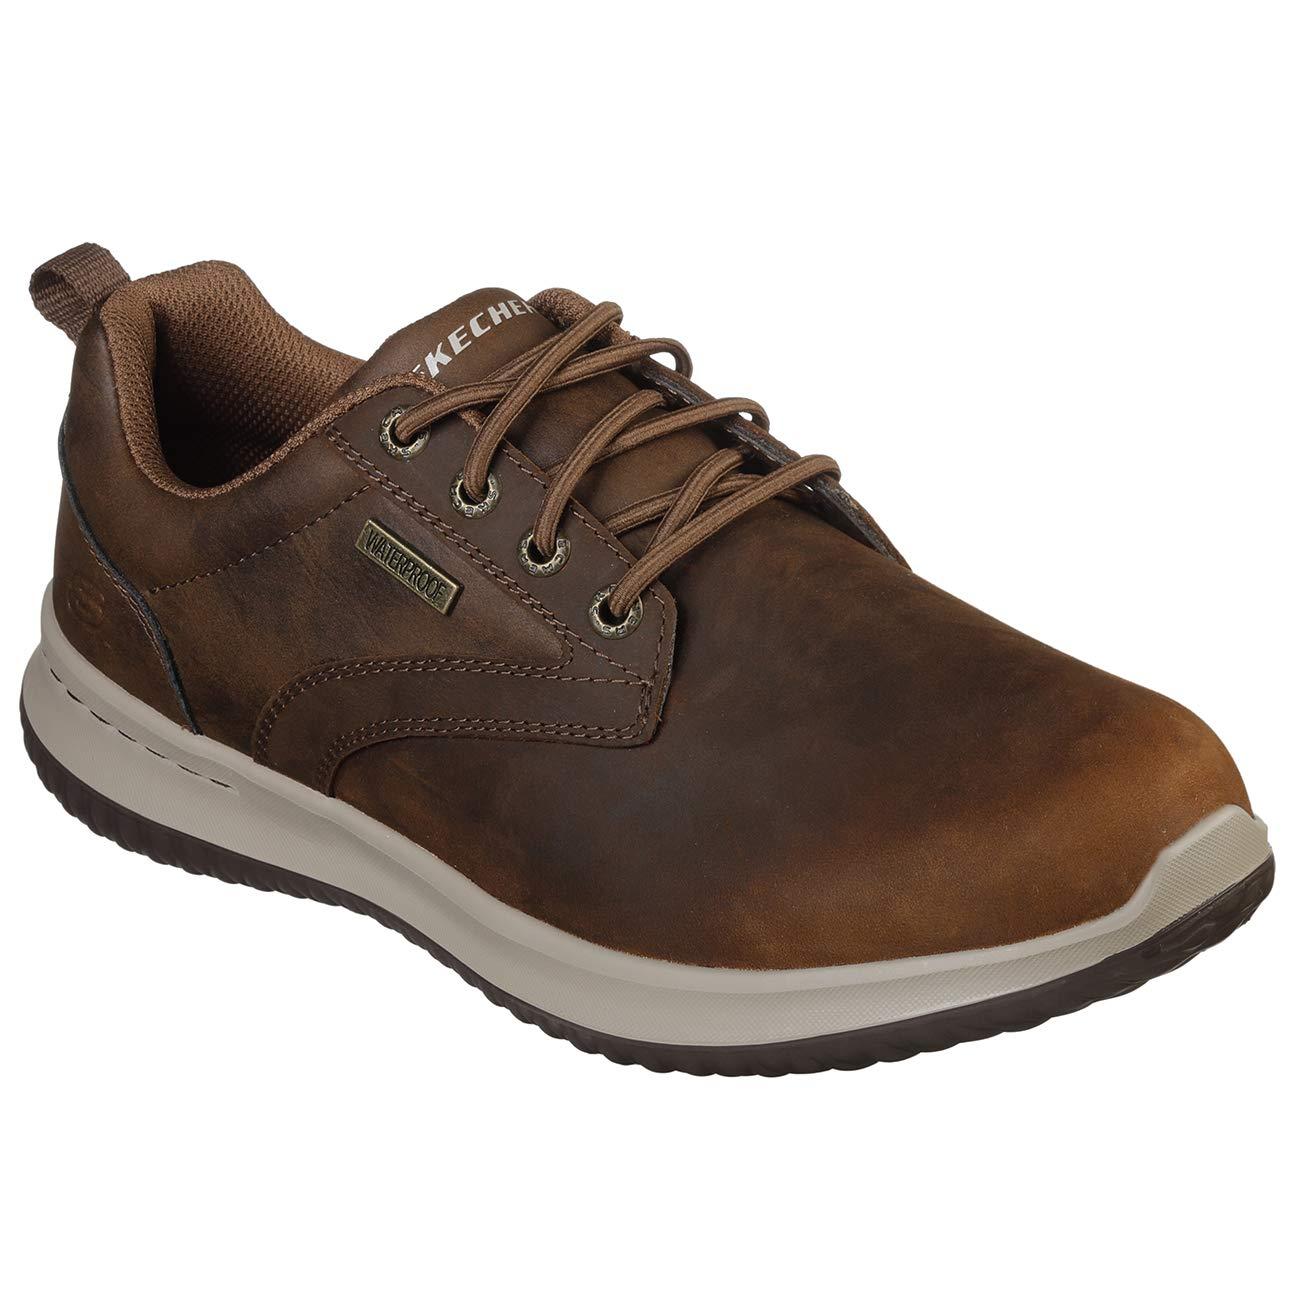 Skechers Men's Delson-Antigo Waterproof Bungee Slip on Sneaker